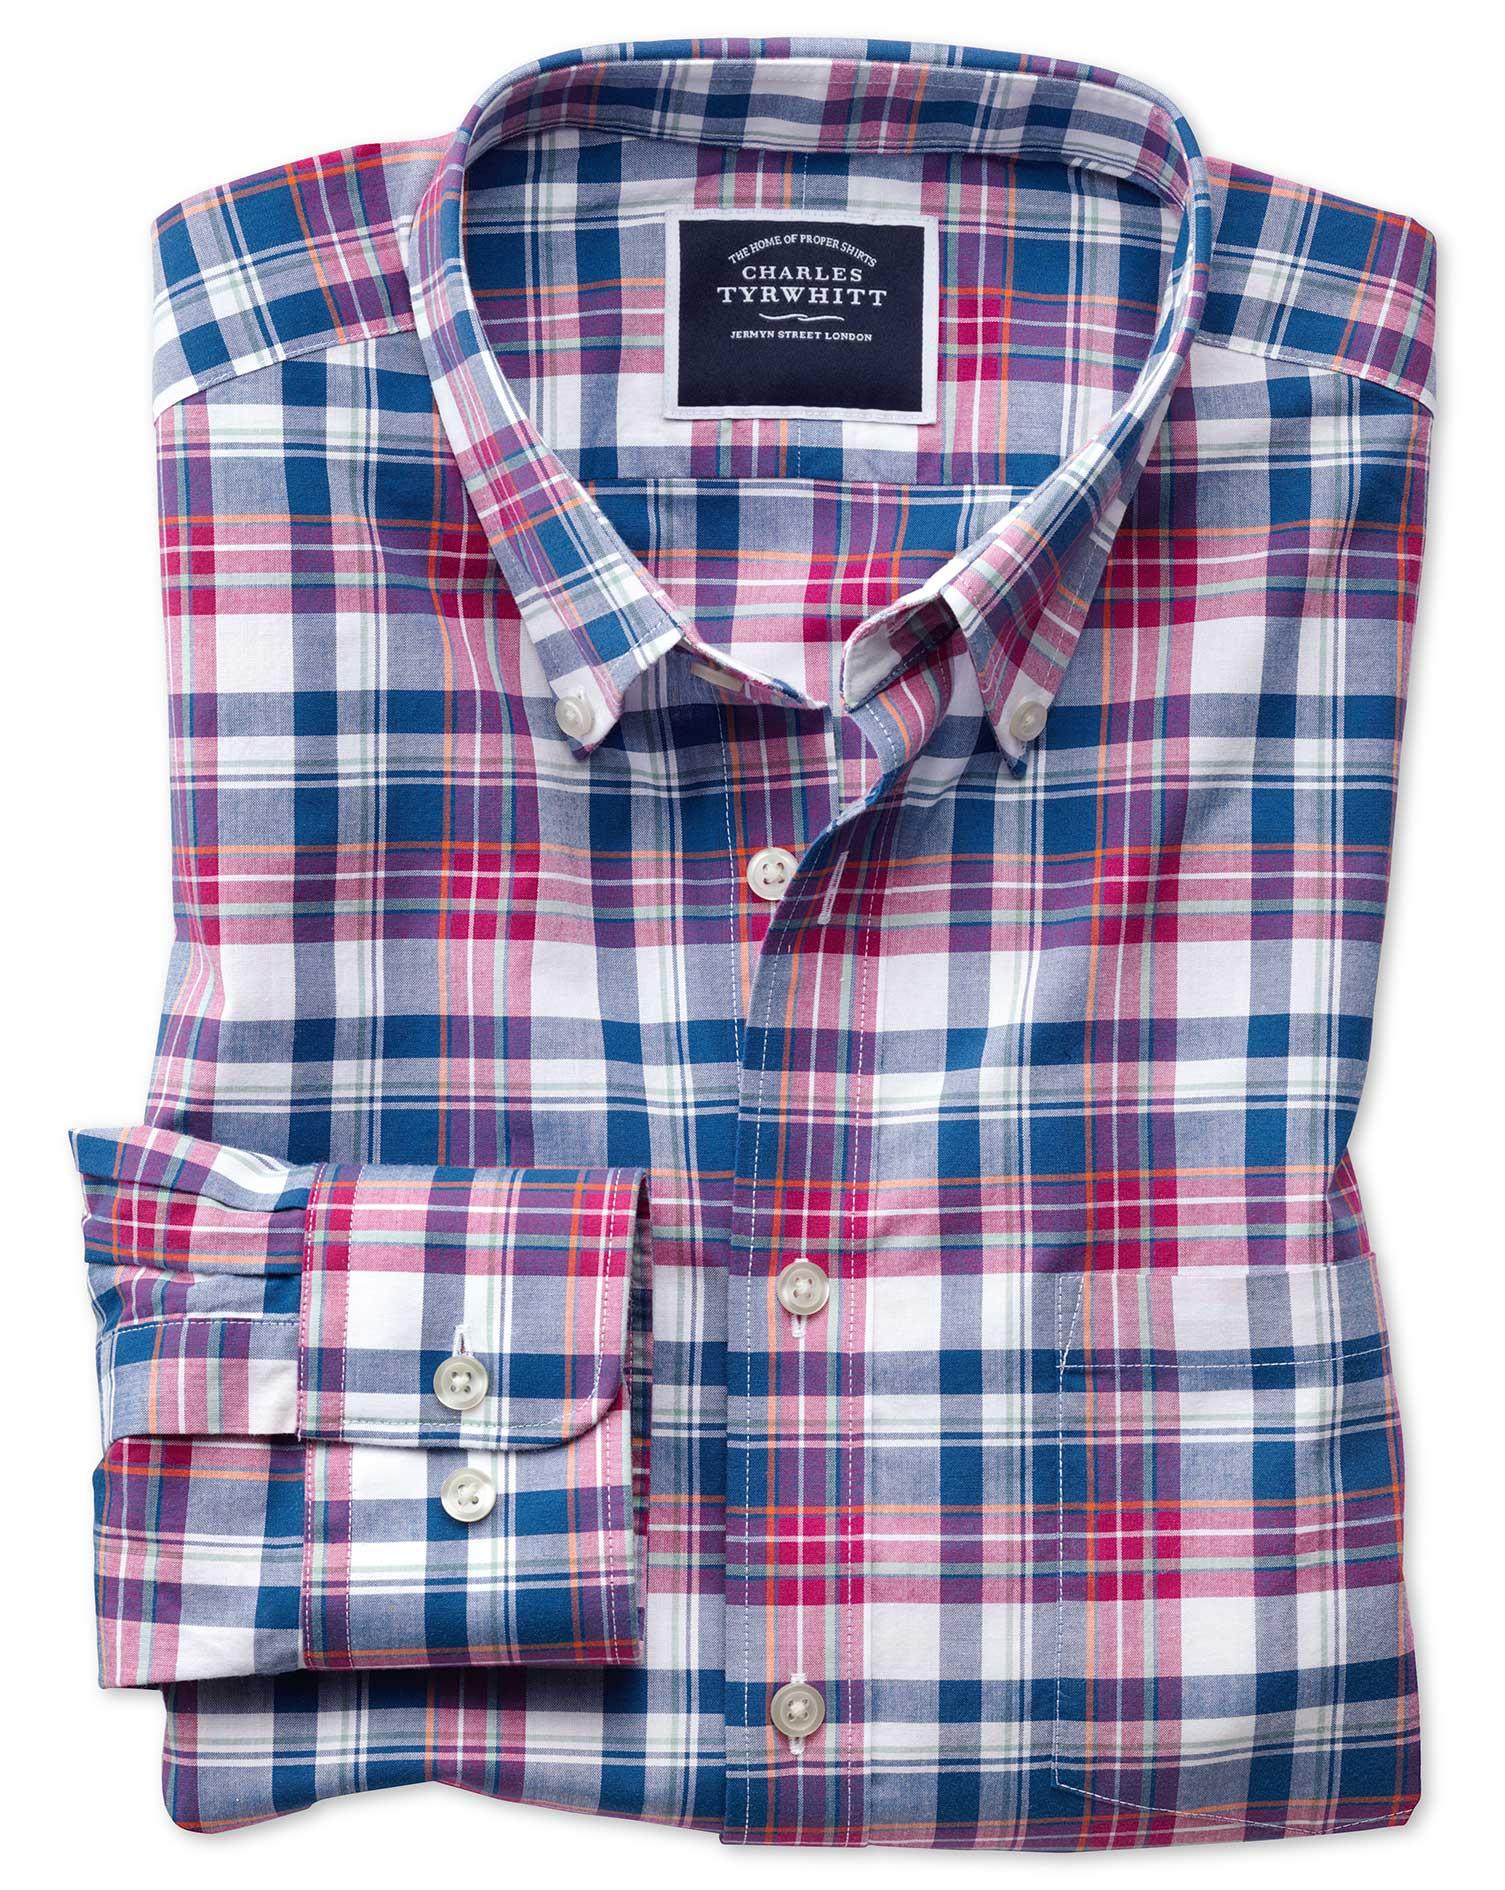 Slim Fit Poplin Pink and Navy Cotton Shirt Single Cuff Size XS by Charles Tyrwhitt